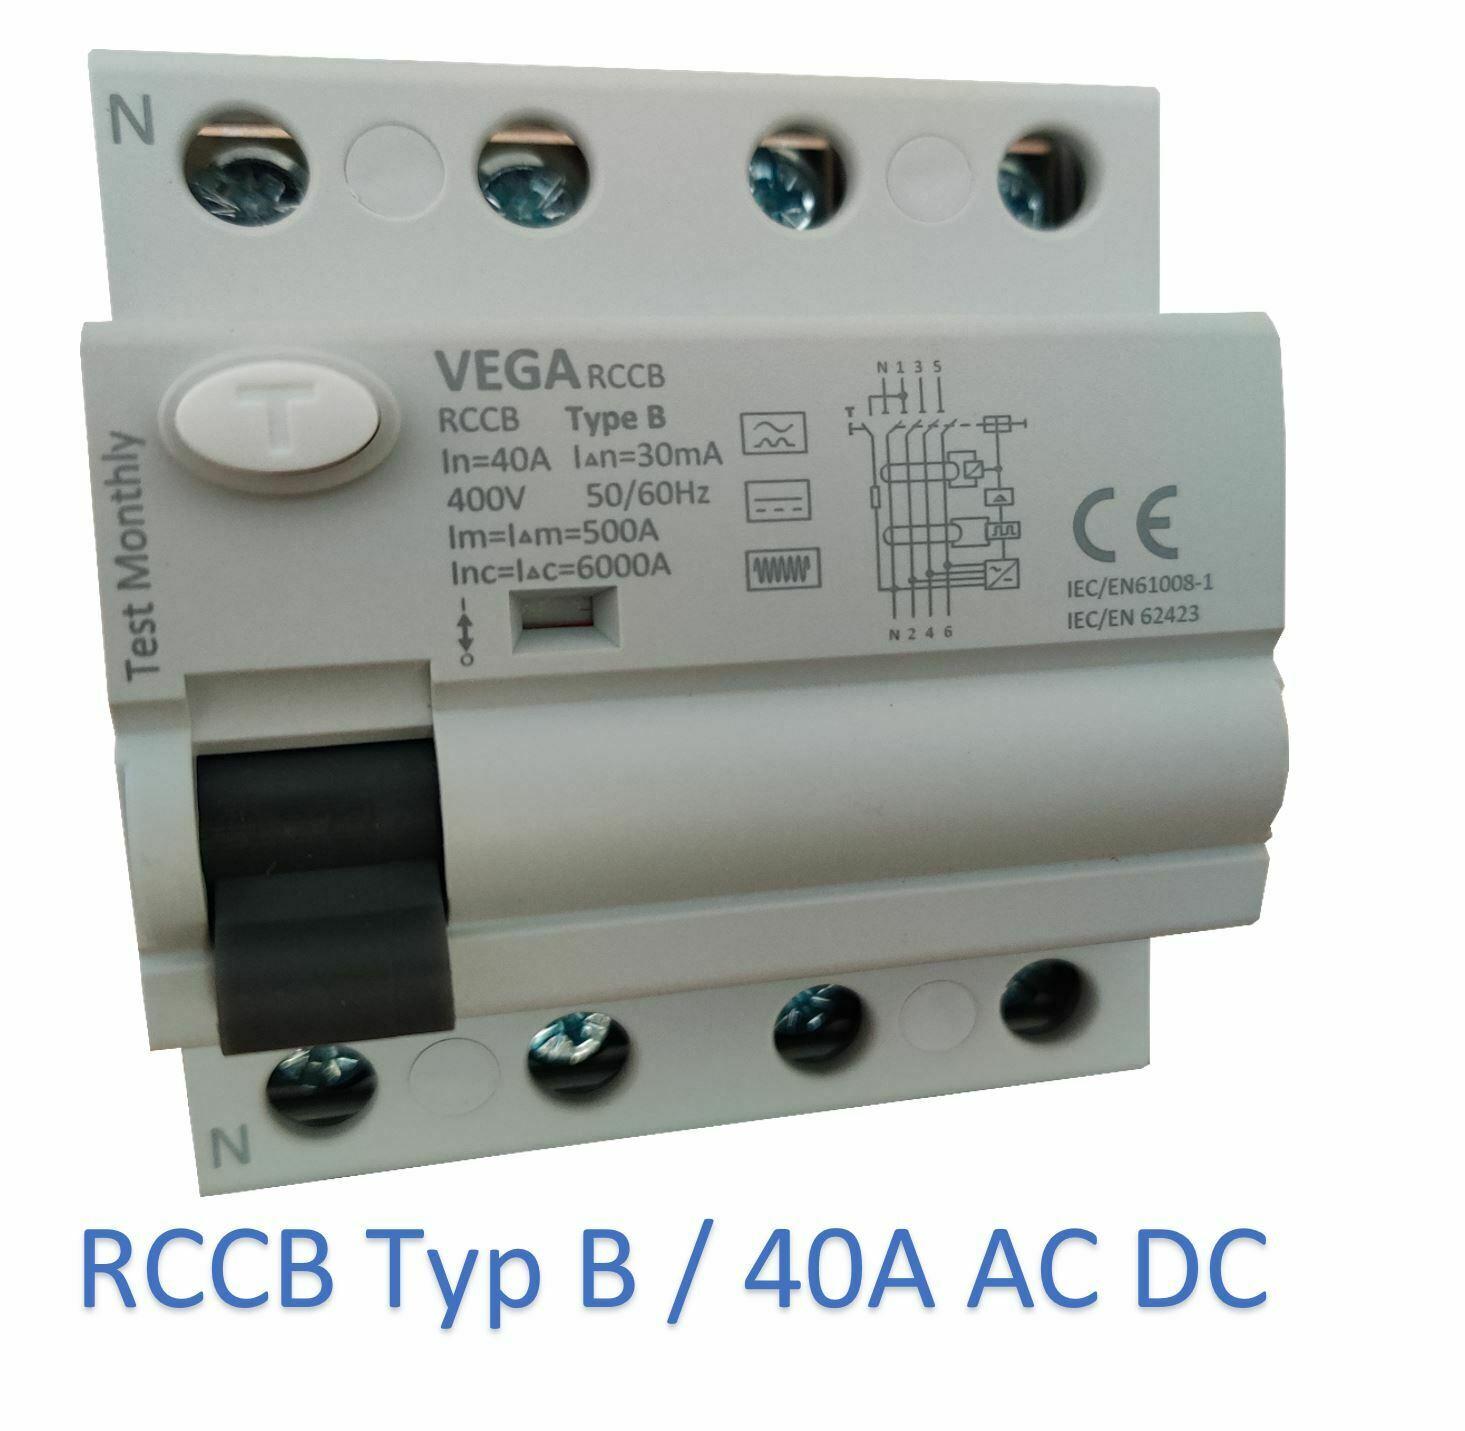 Vega RCCB FI Fehlerstromschutzschalter 40A 4-pol. Typ B Elektroauto PV Anlage